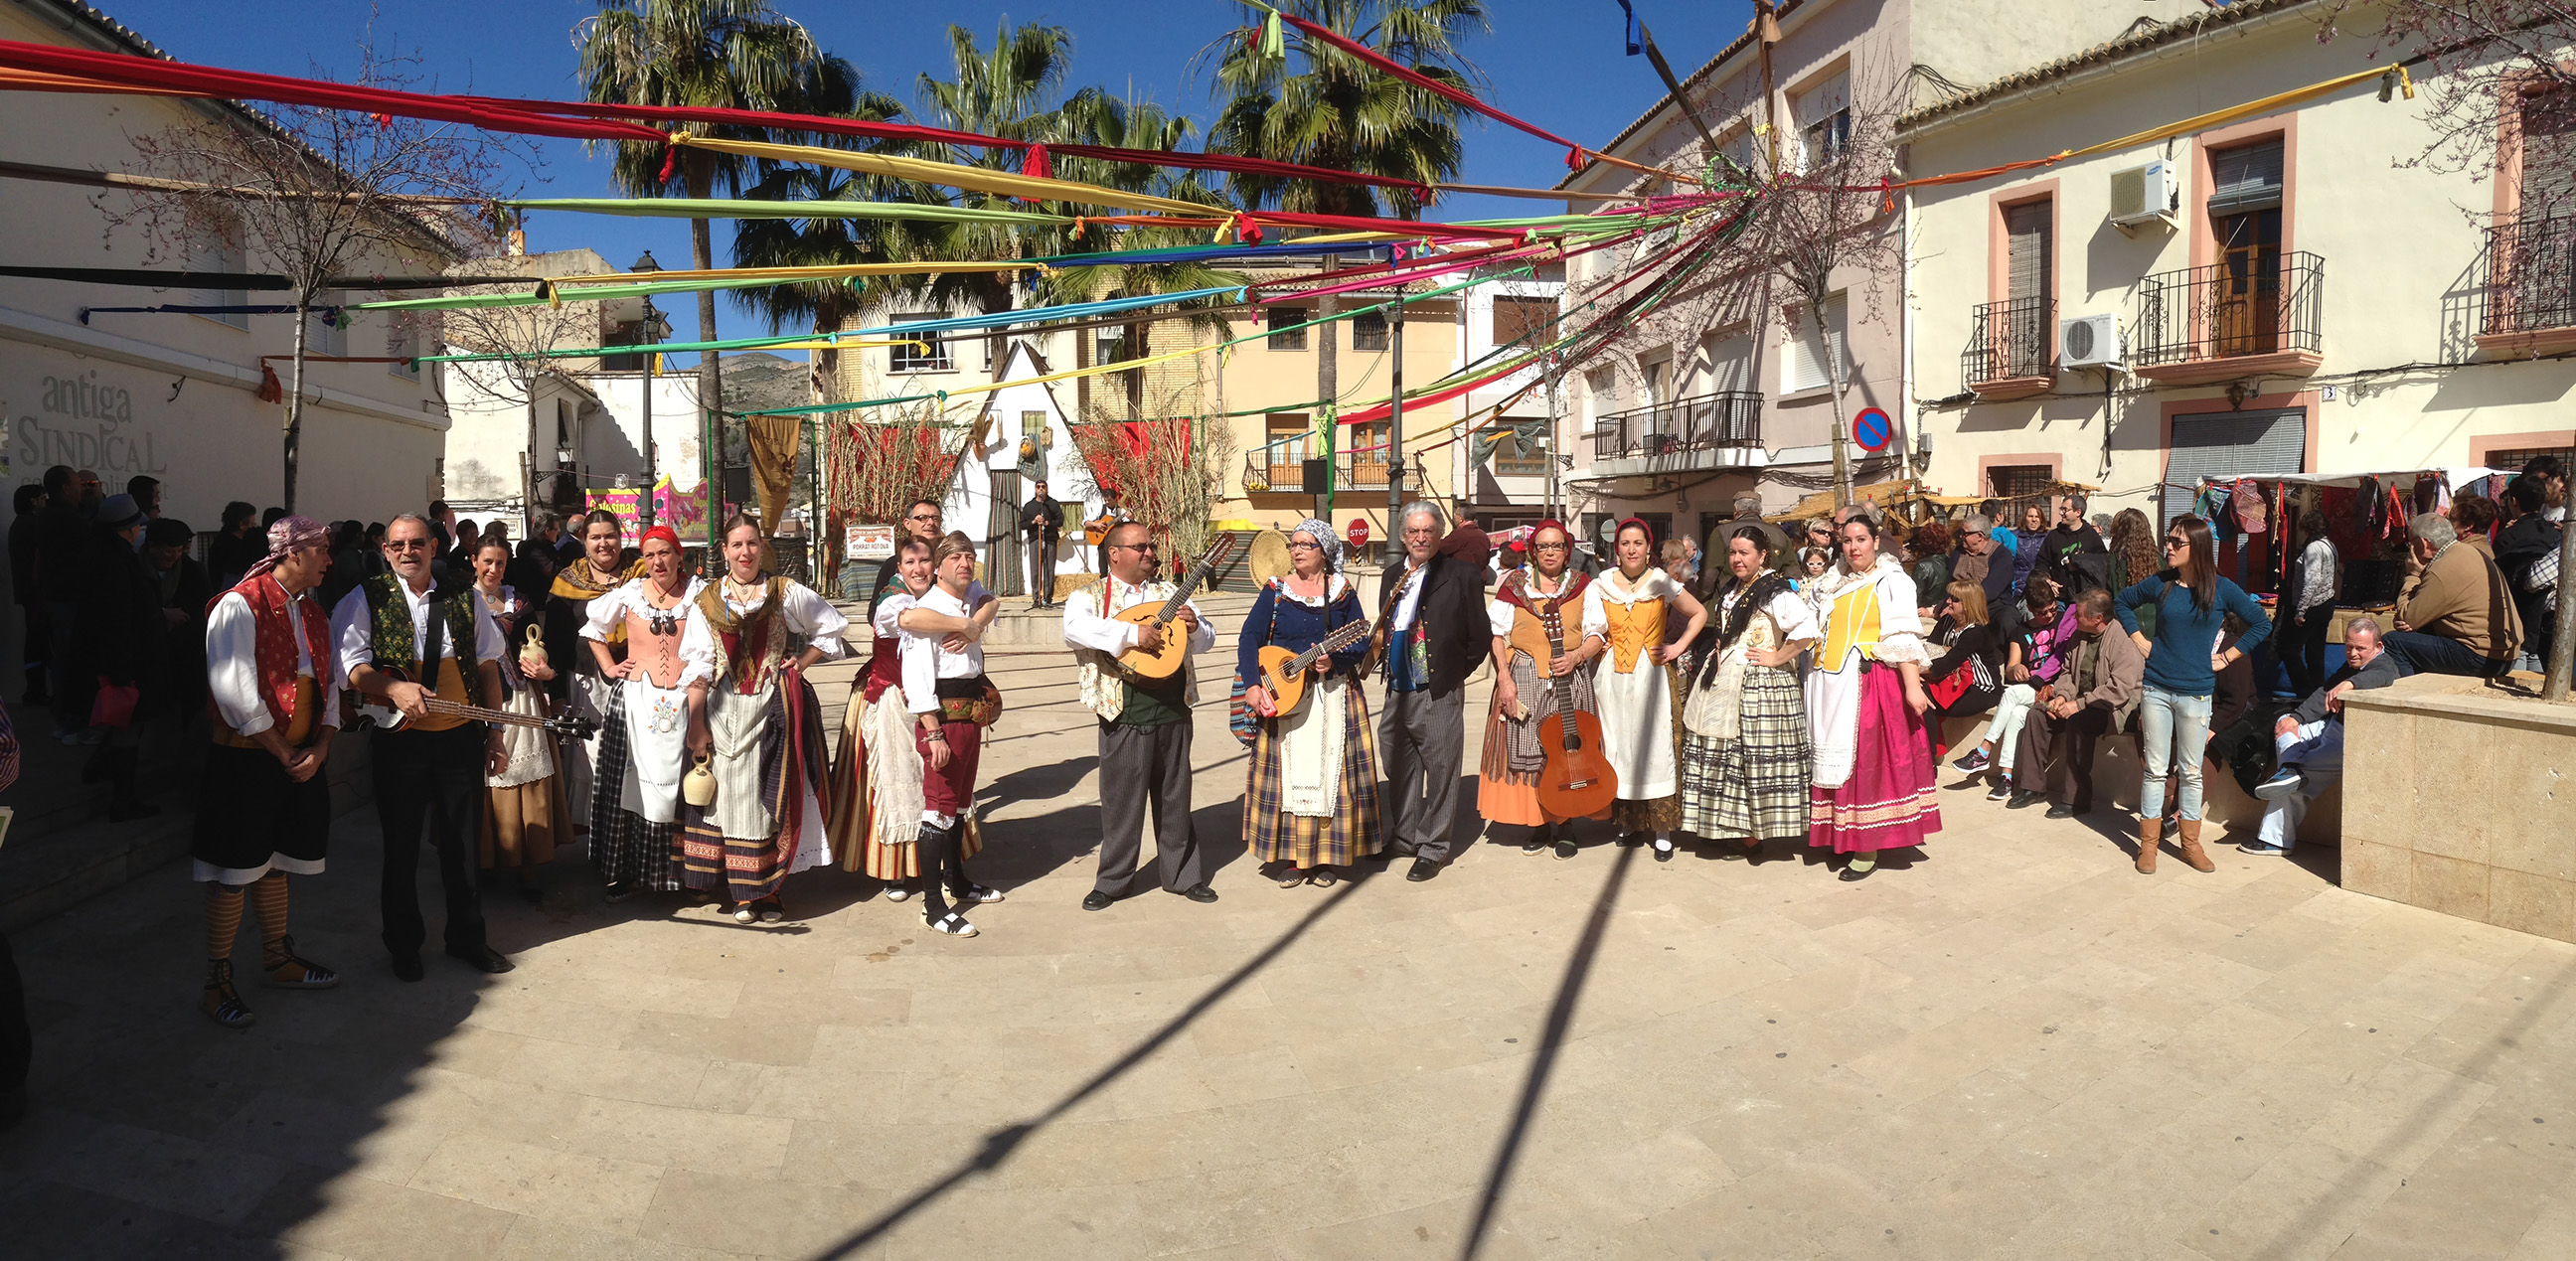 2014-02-22 - Baladre a Fira St. Marcia-ROTOVA (7)